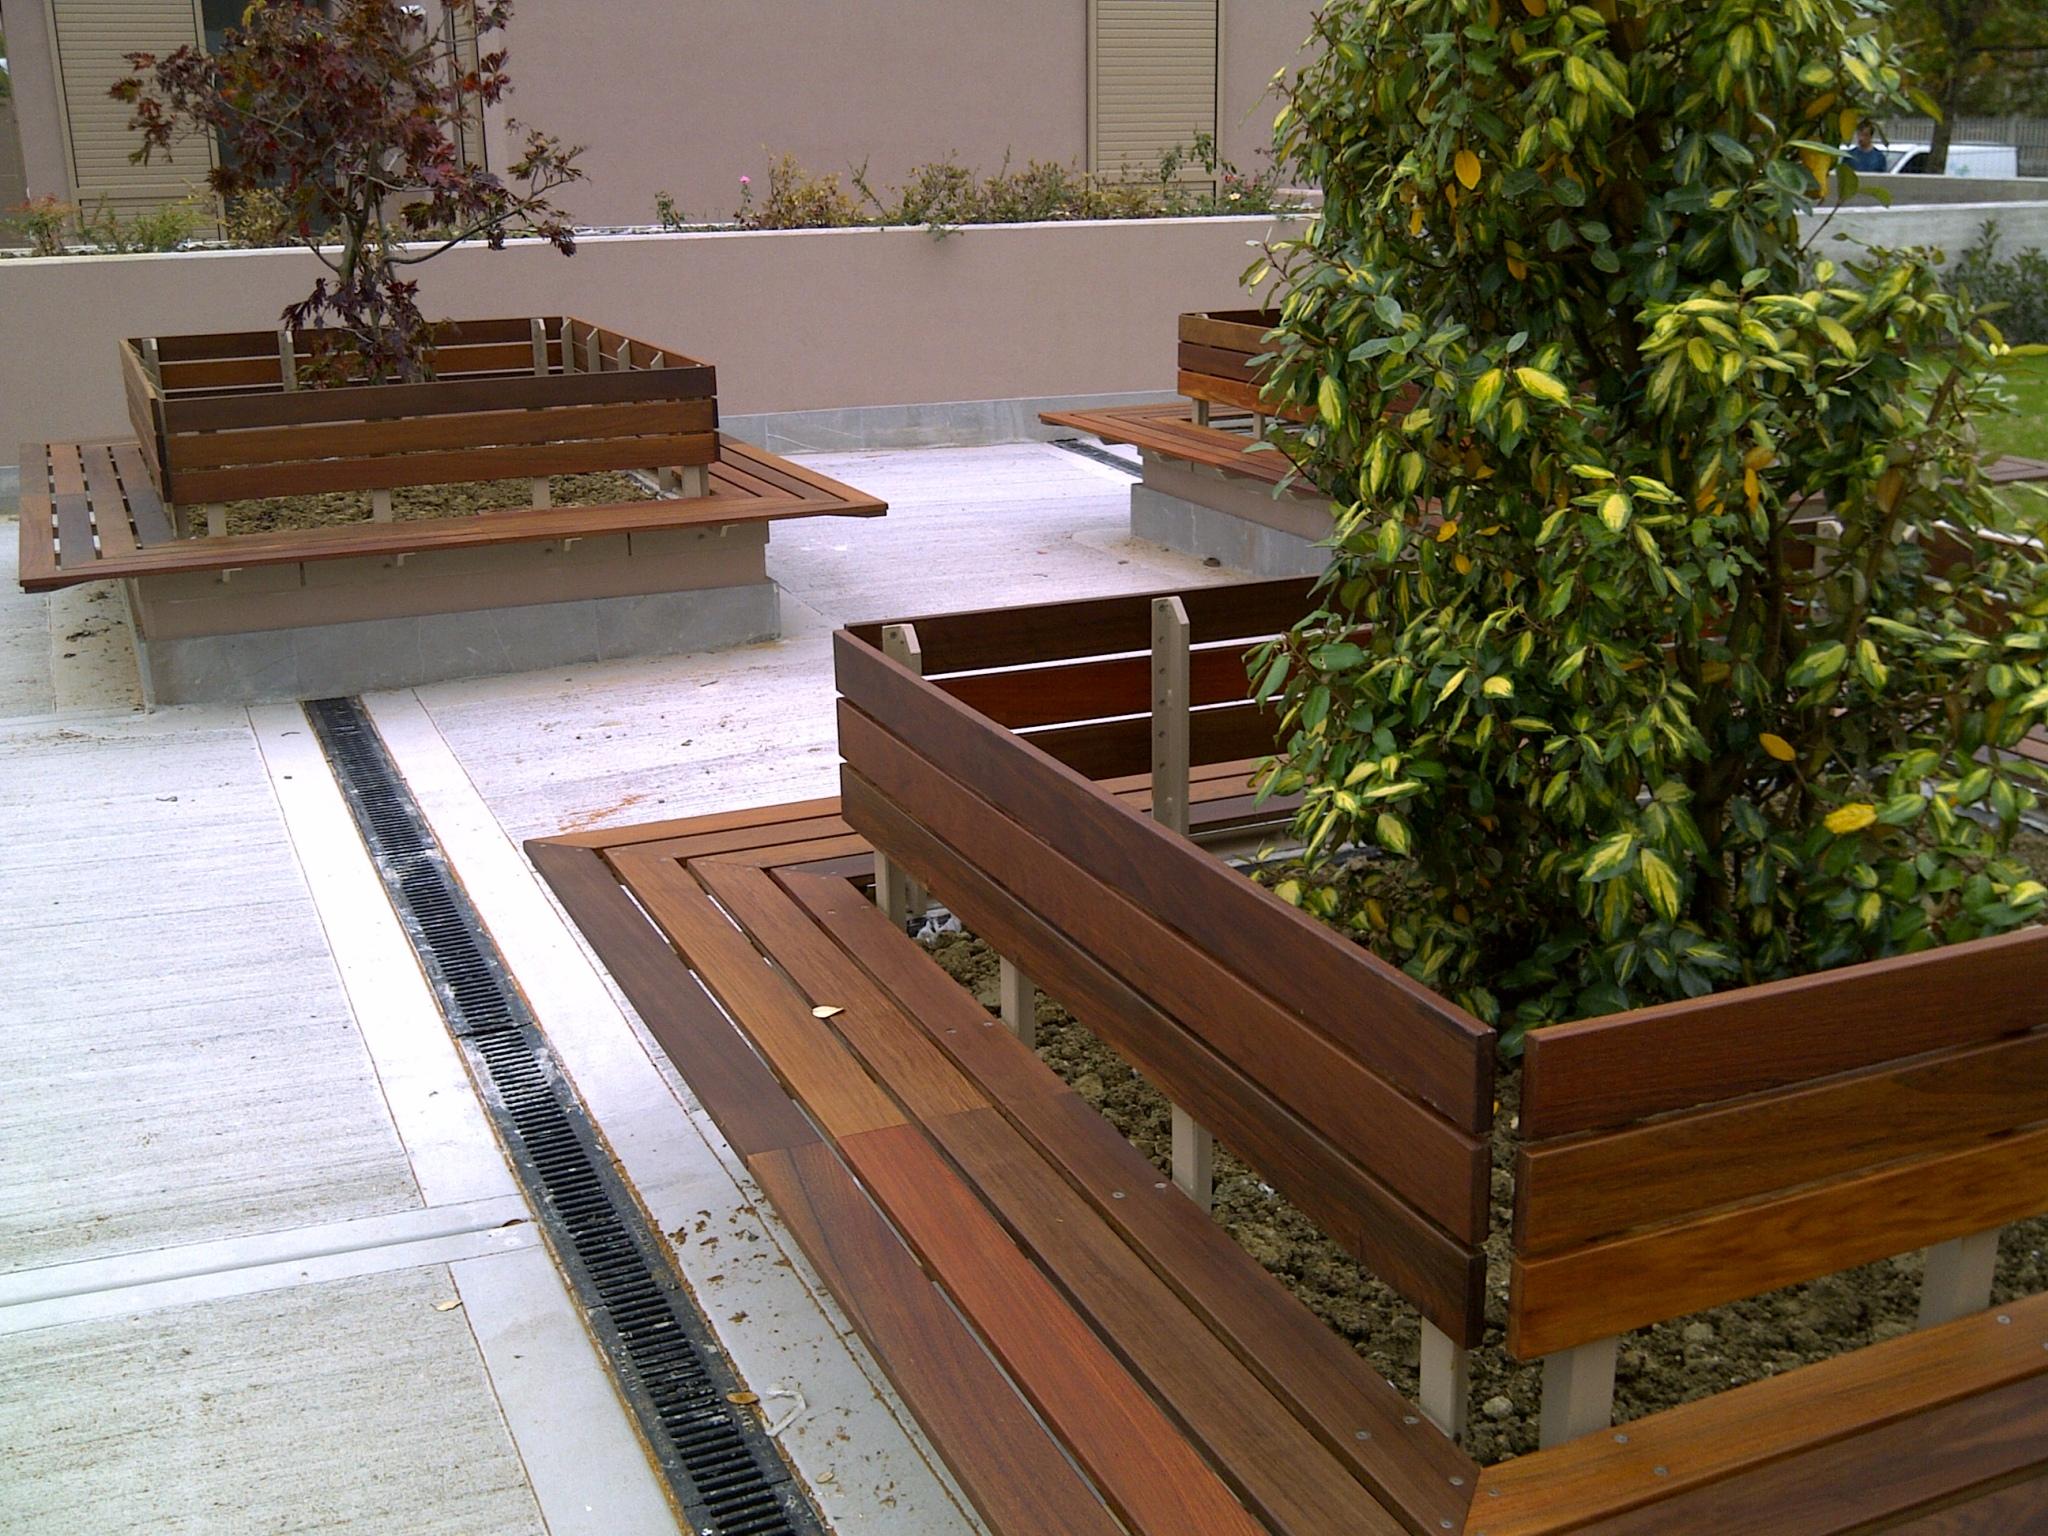 Arredi per l 39 esterno arredi e arredamenti in legno per - Divanetto in legno per esterno ...